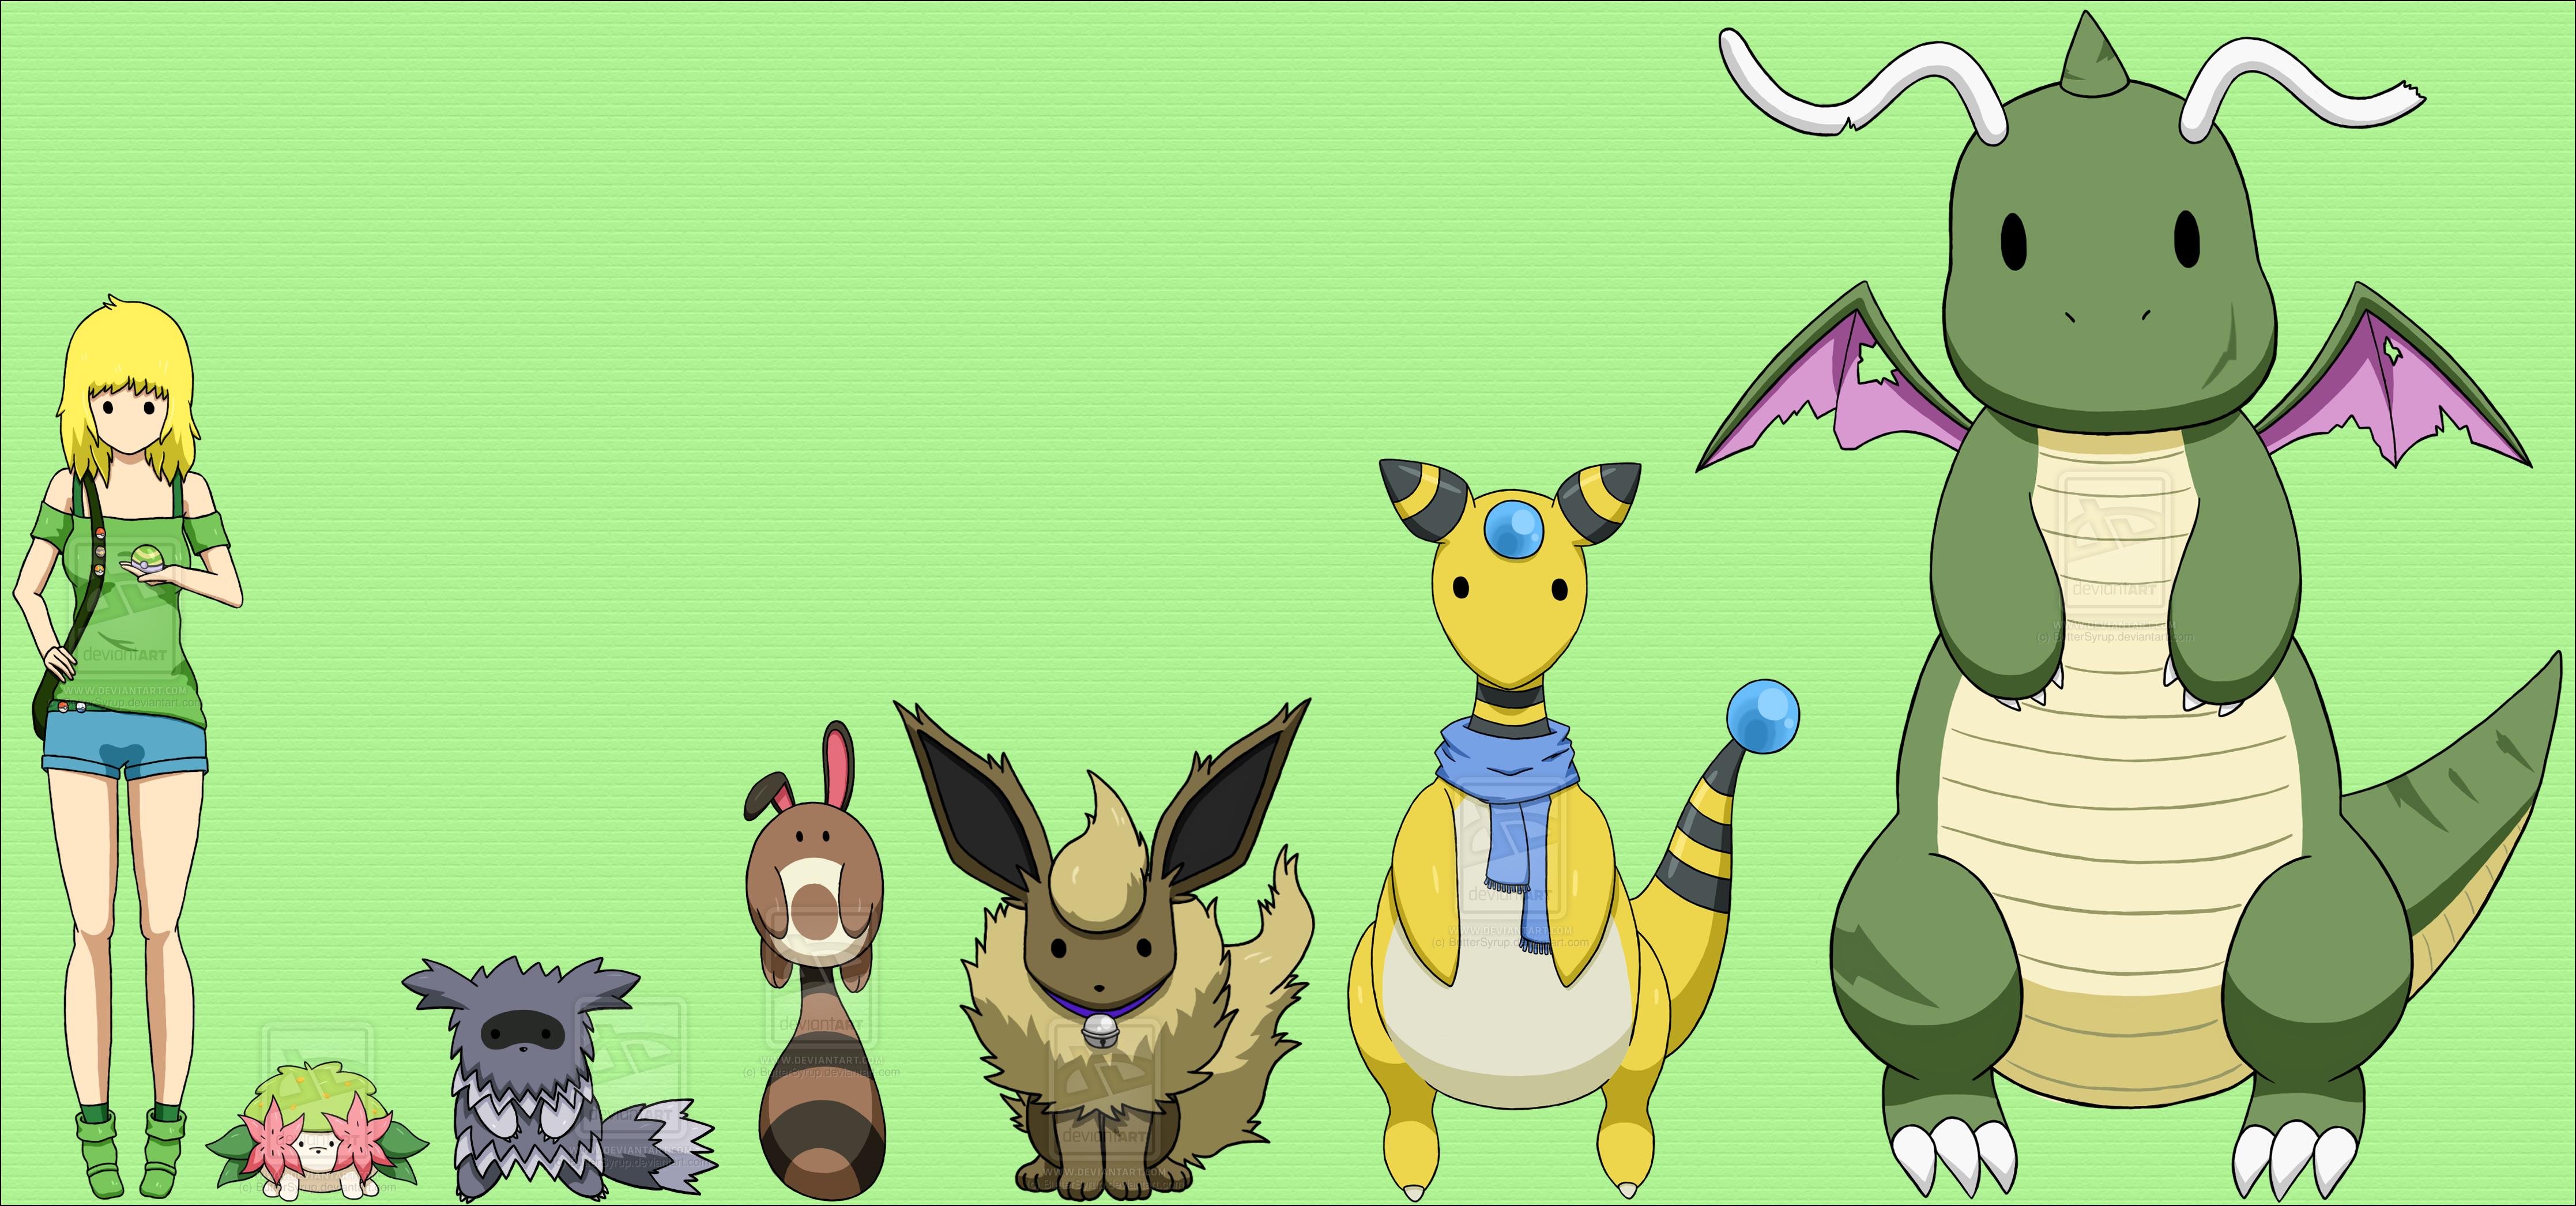 Pokemon Zigzagoon Images | Pokemon Images